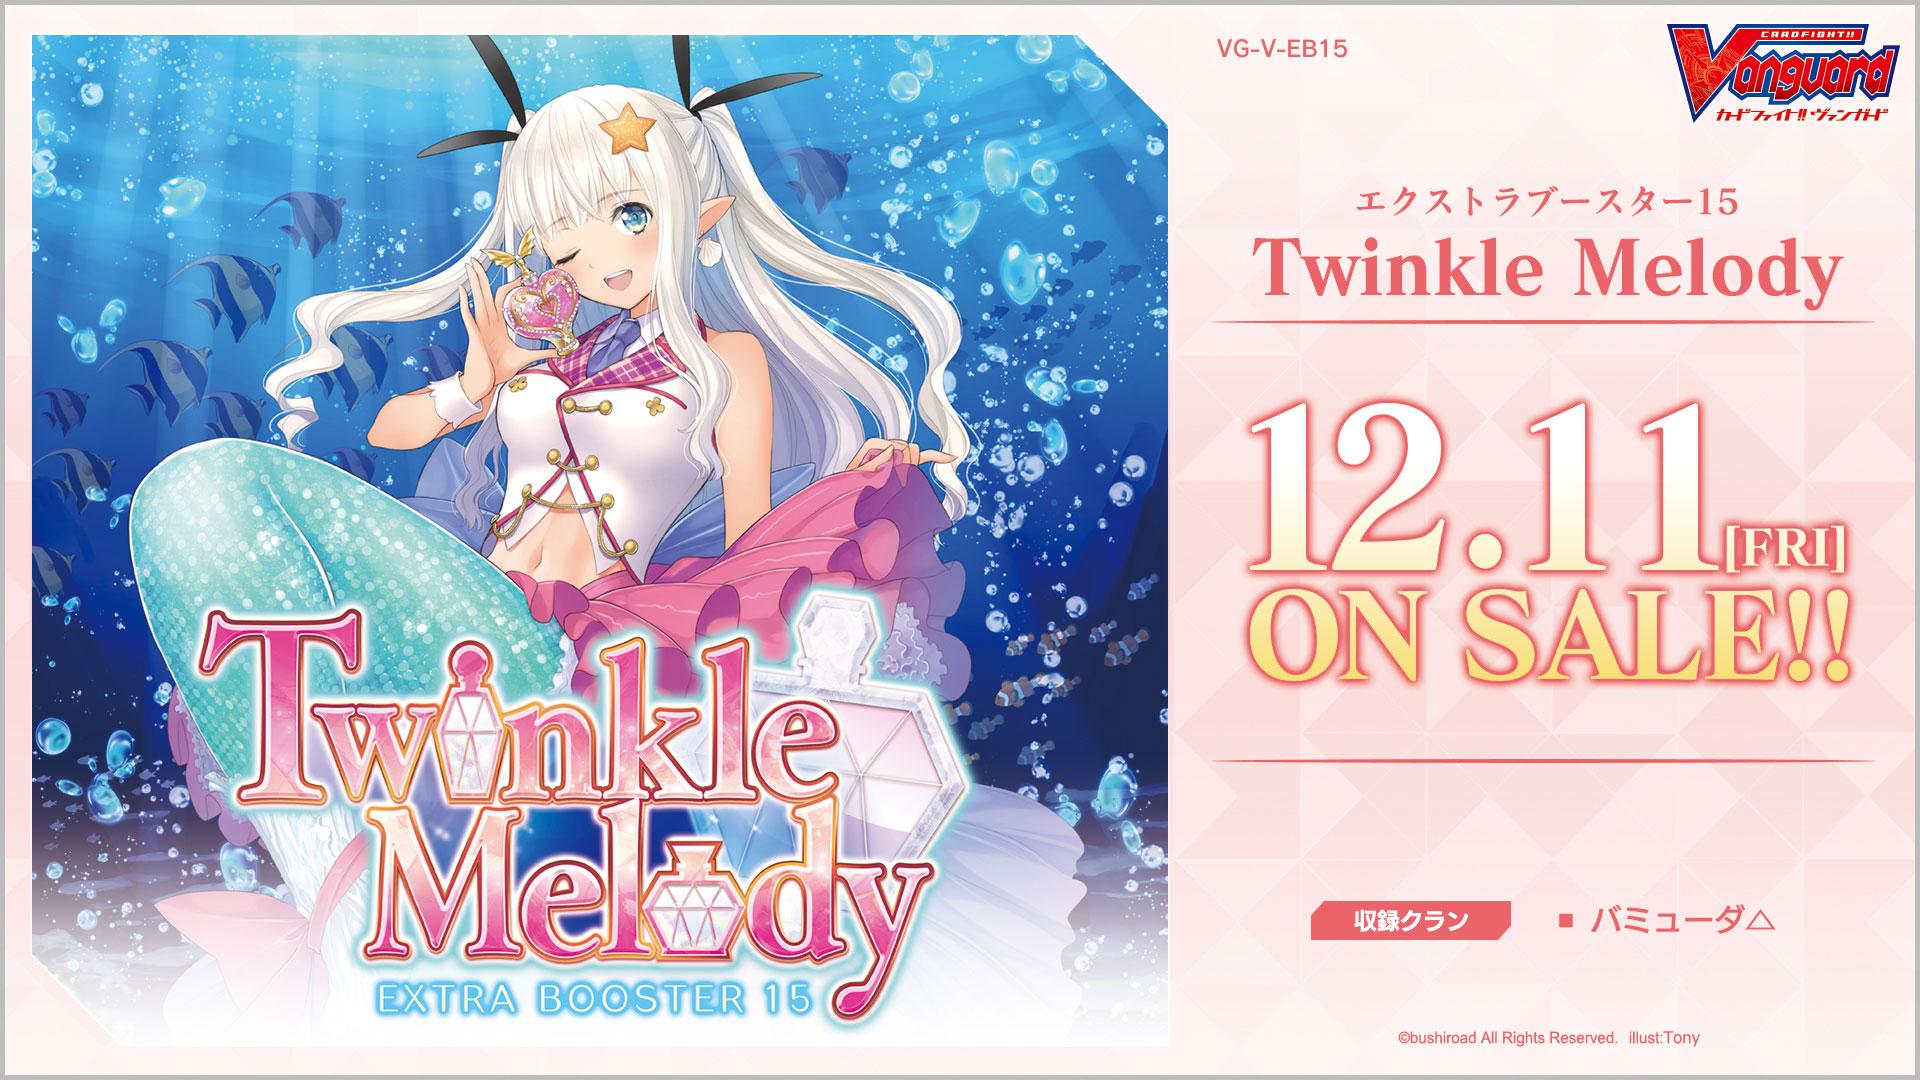 【V-EB15】「Twinkle Melody」